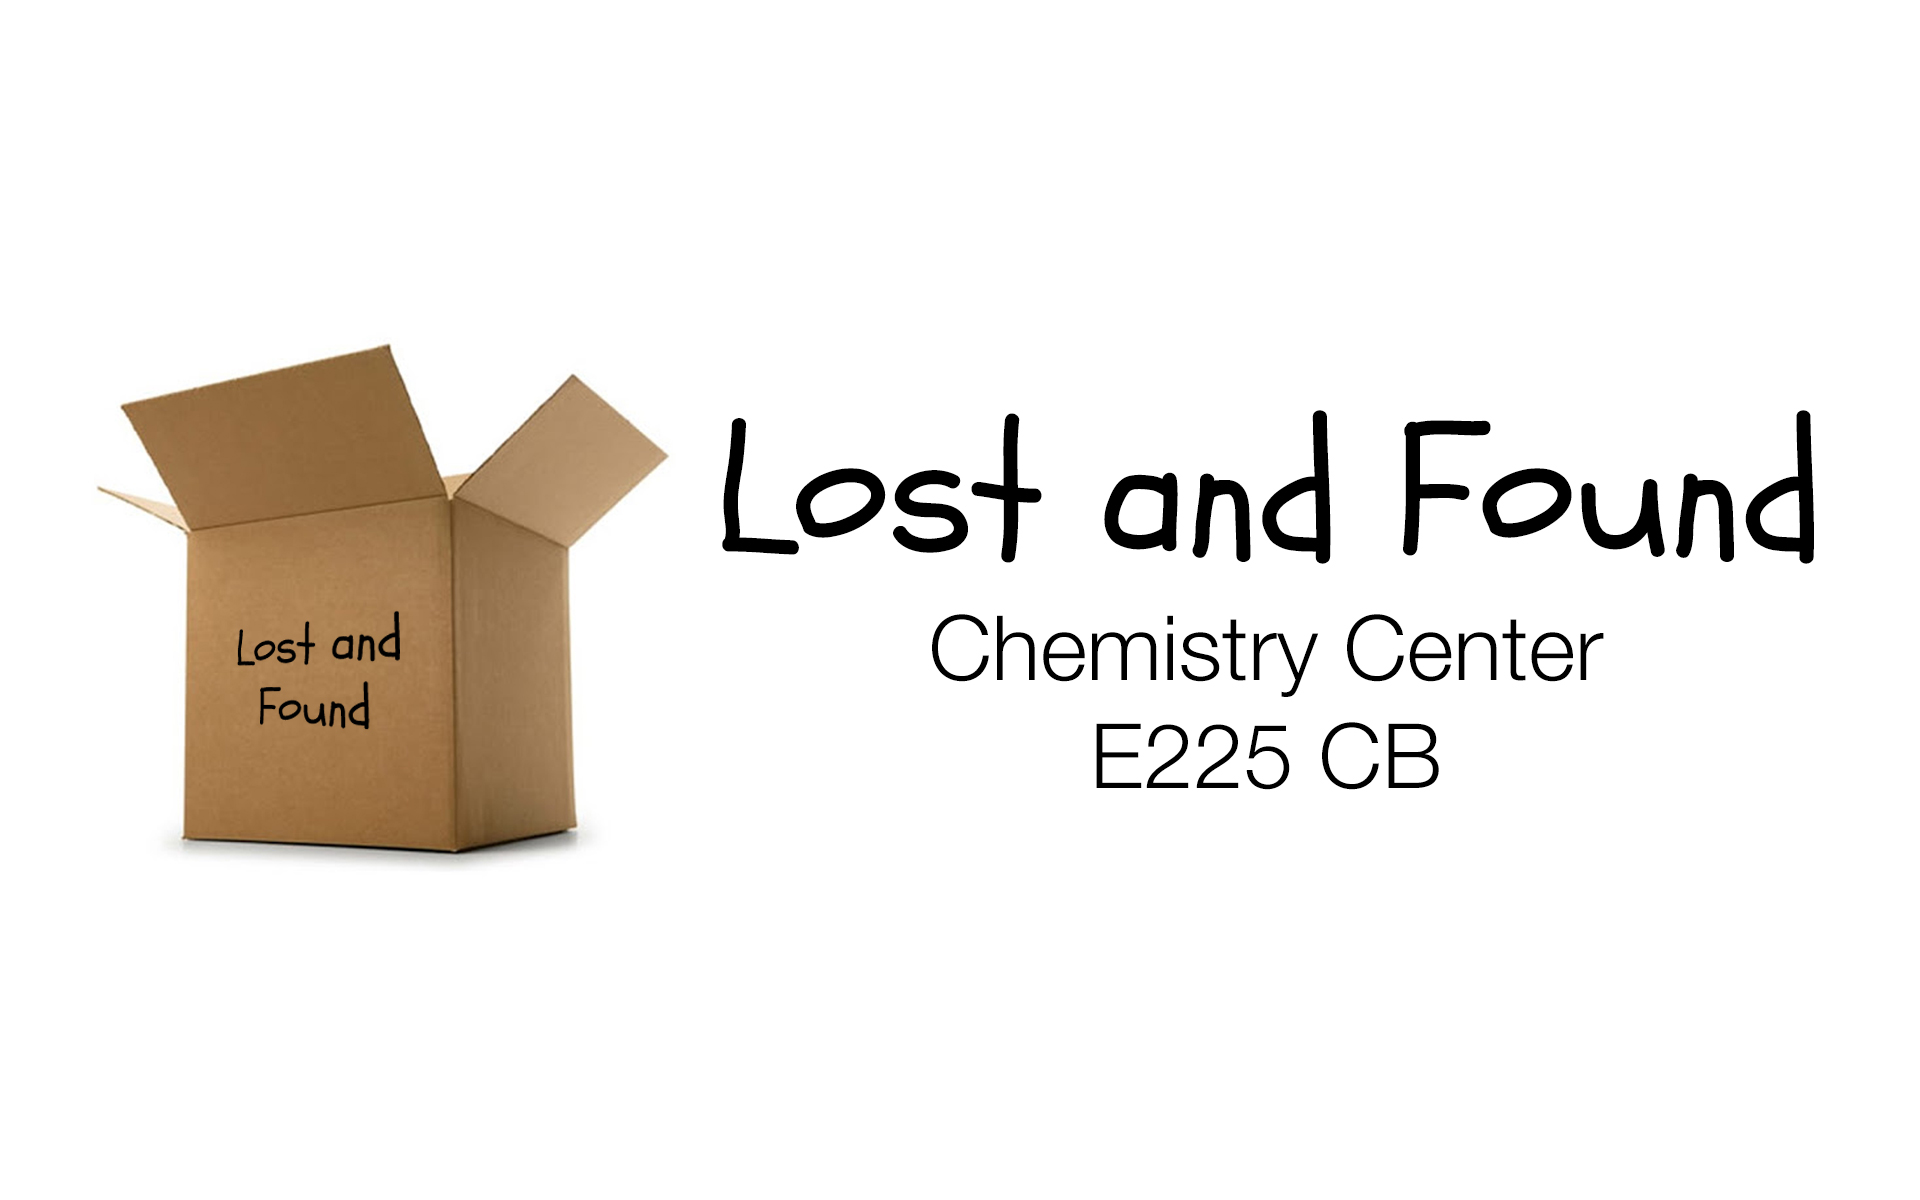 Lost and Found, located in the Chemistry Center, E225 CB